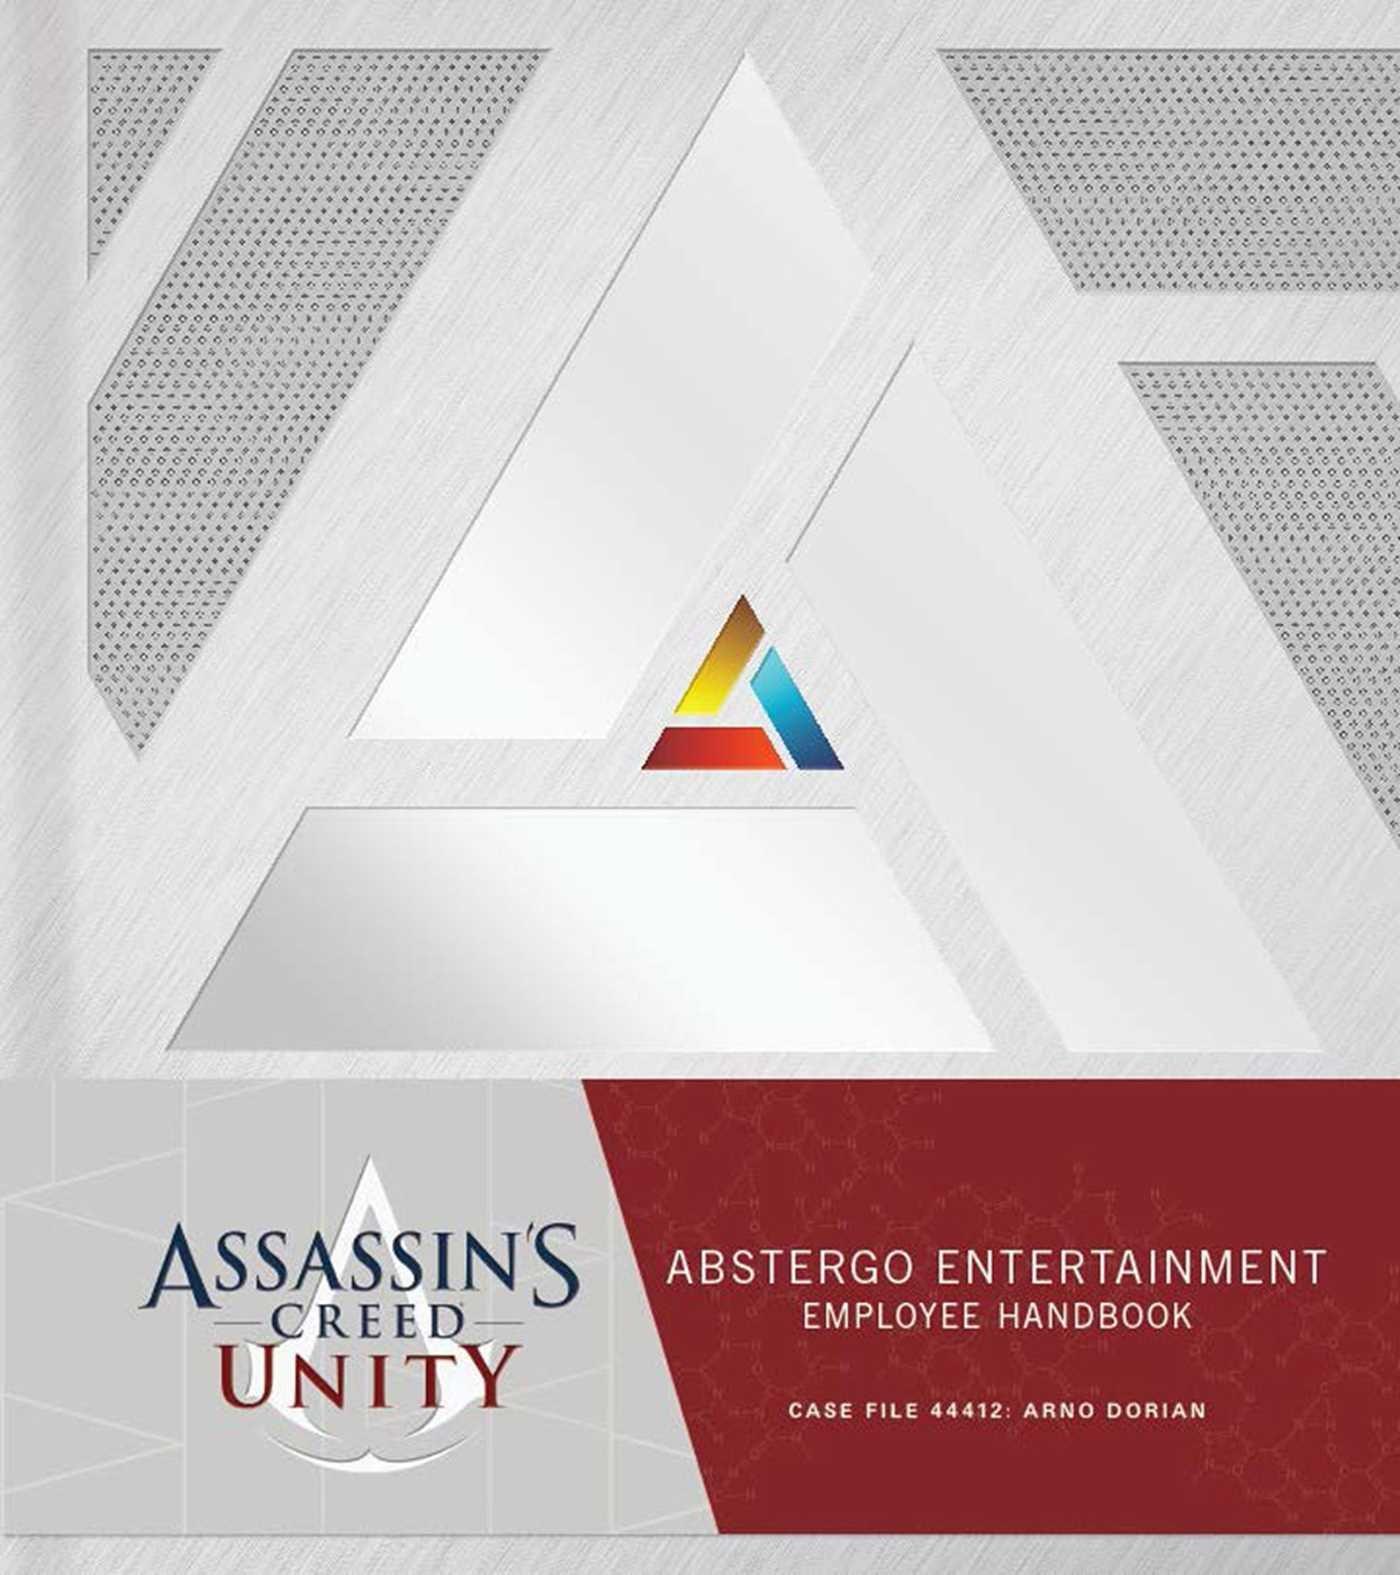 Assassin's Creed Unity: Abstergo Entertainment: Employee Handbook